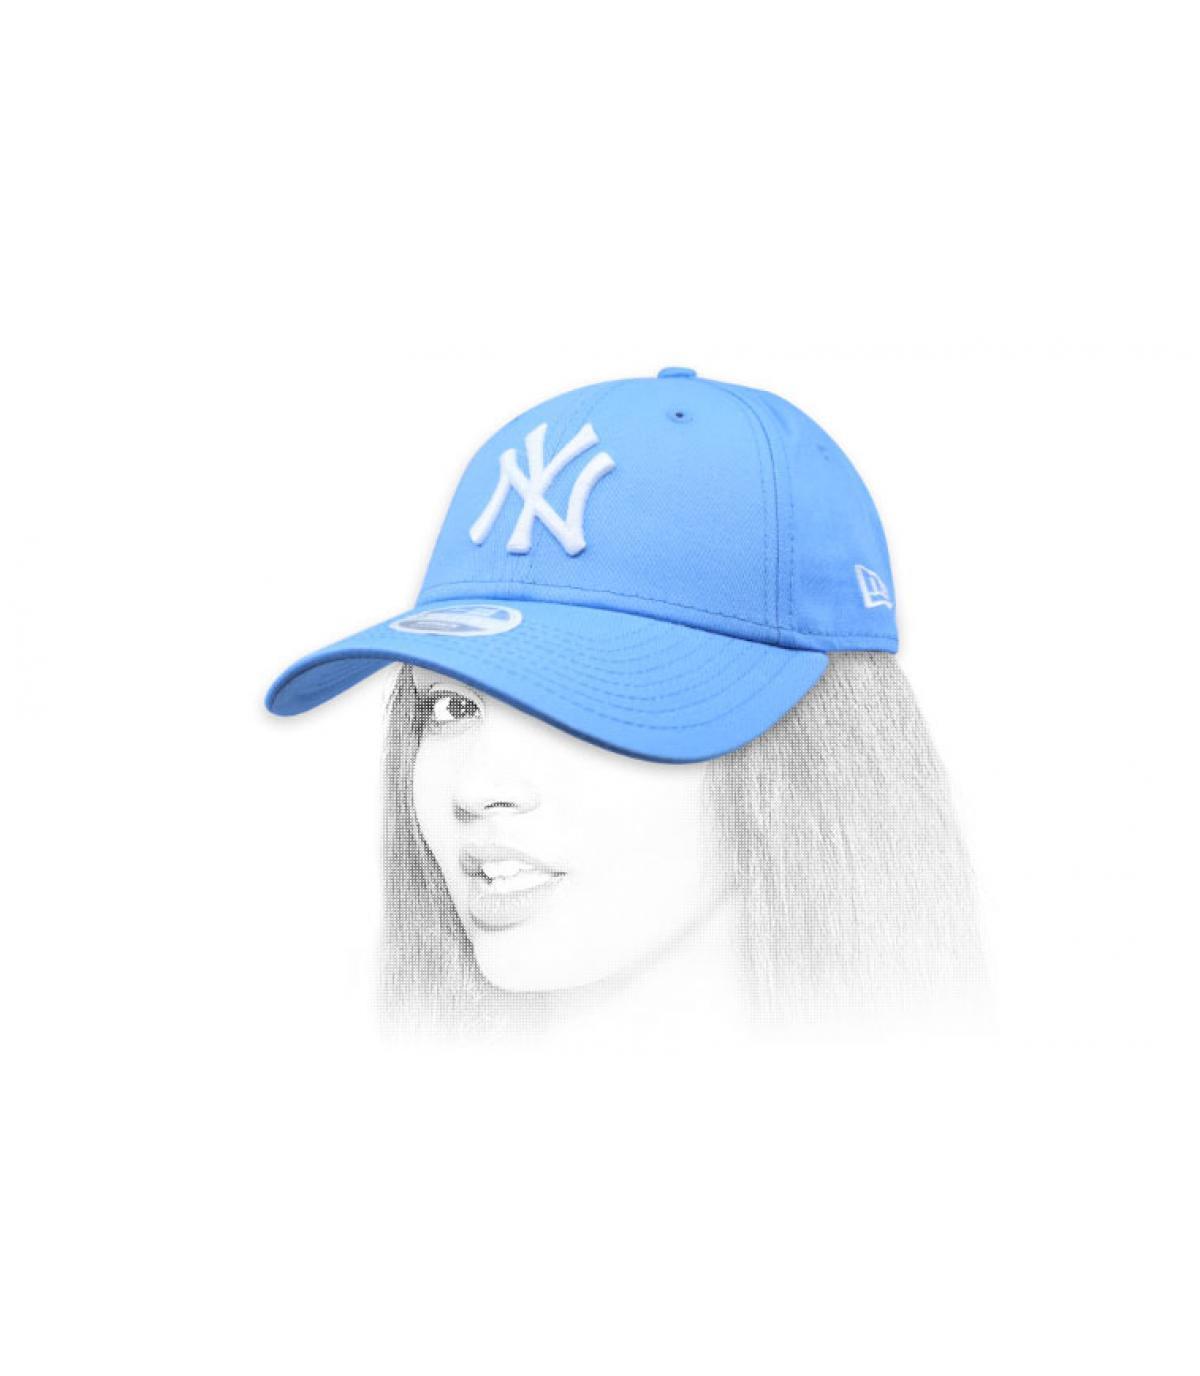 Damen Cap NY blau